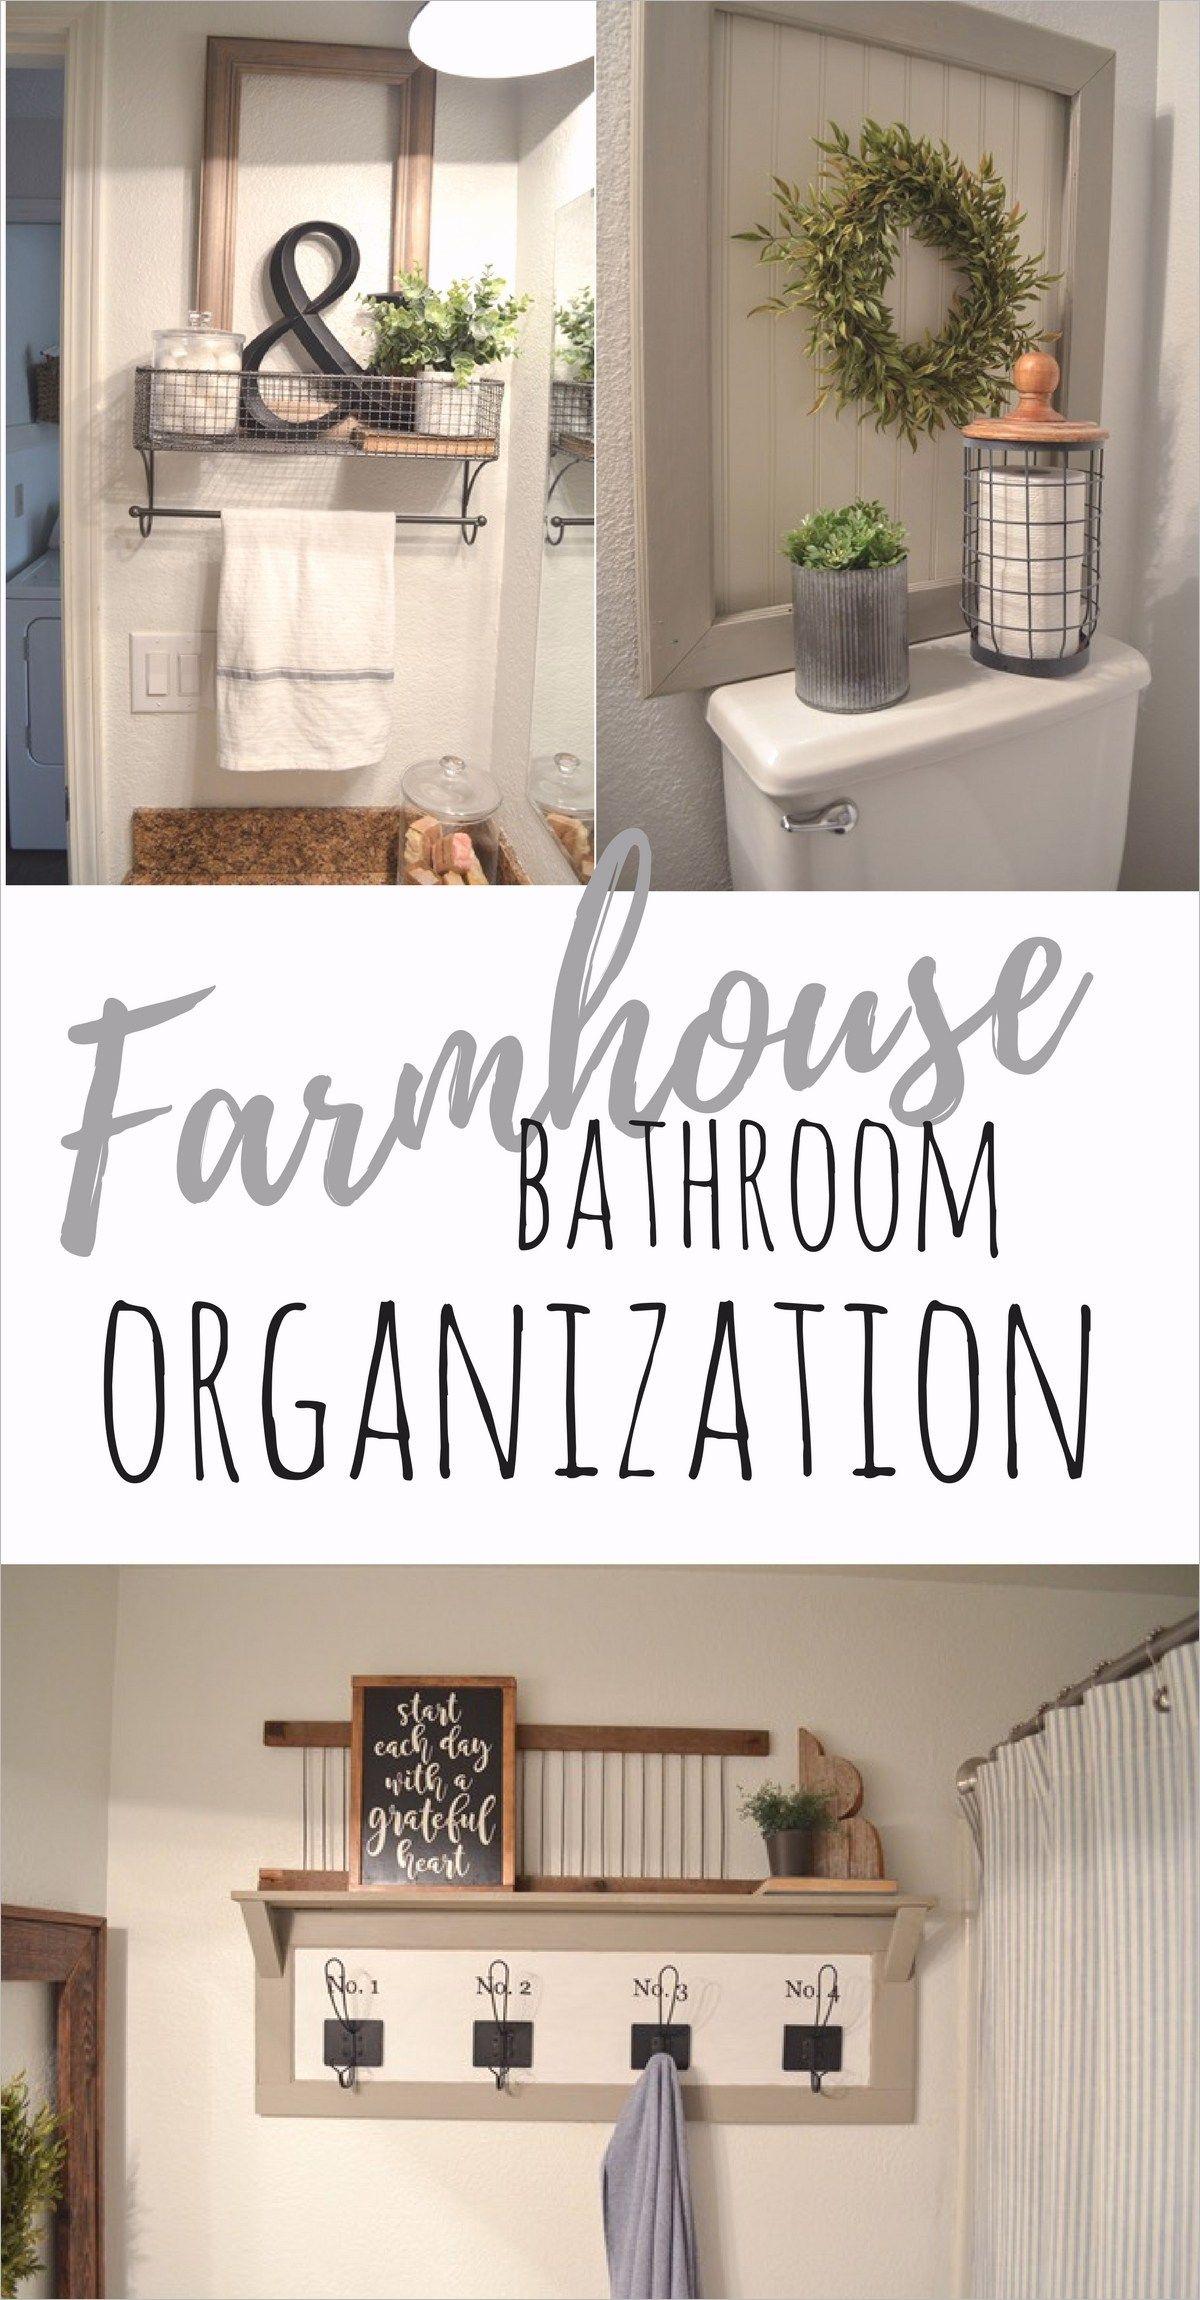 40 Best And Cheap Farmhouse Bathroom Accessories 61 Farmhouse Bathroom Organizers Farmhouse Bathroom Decor Bathroom Decor